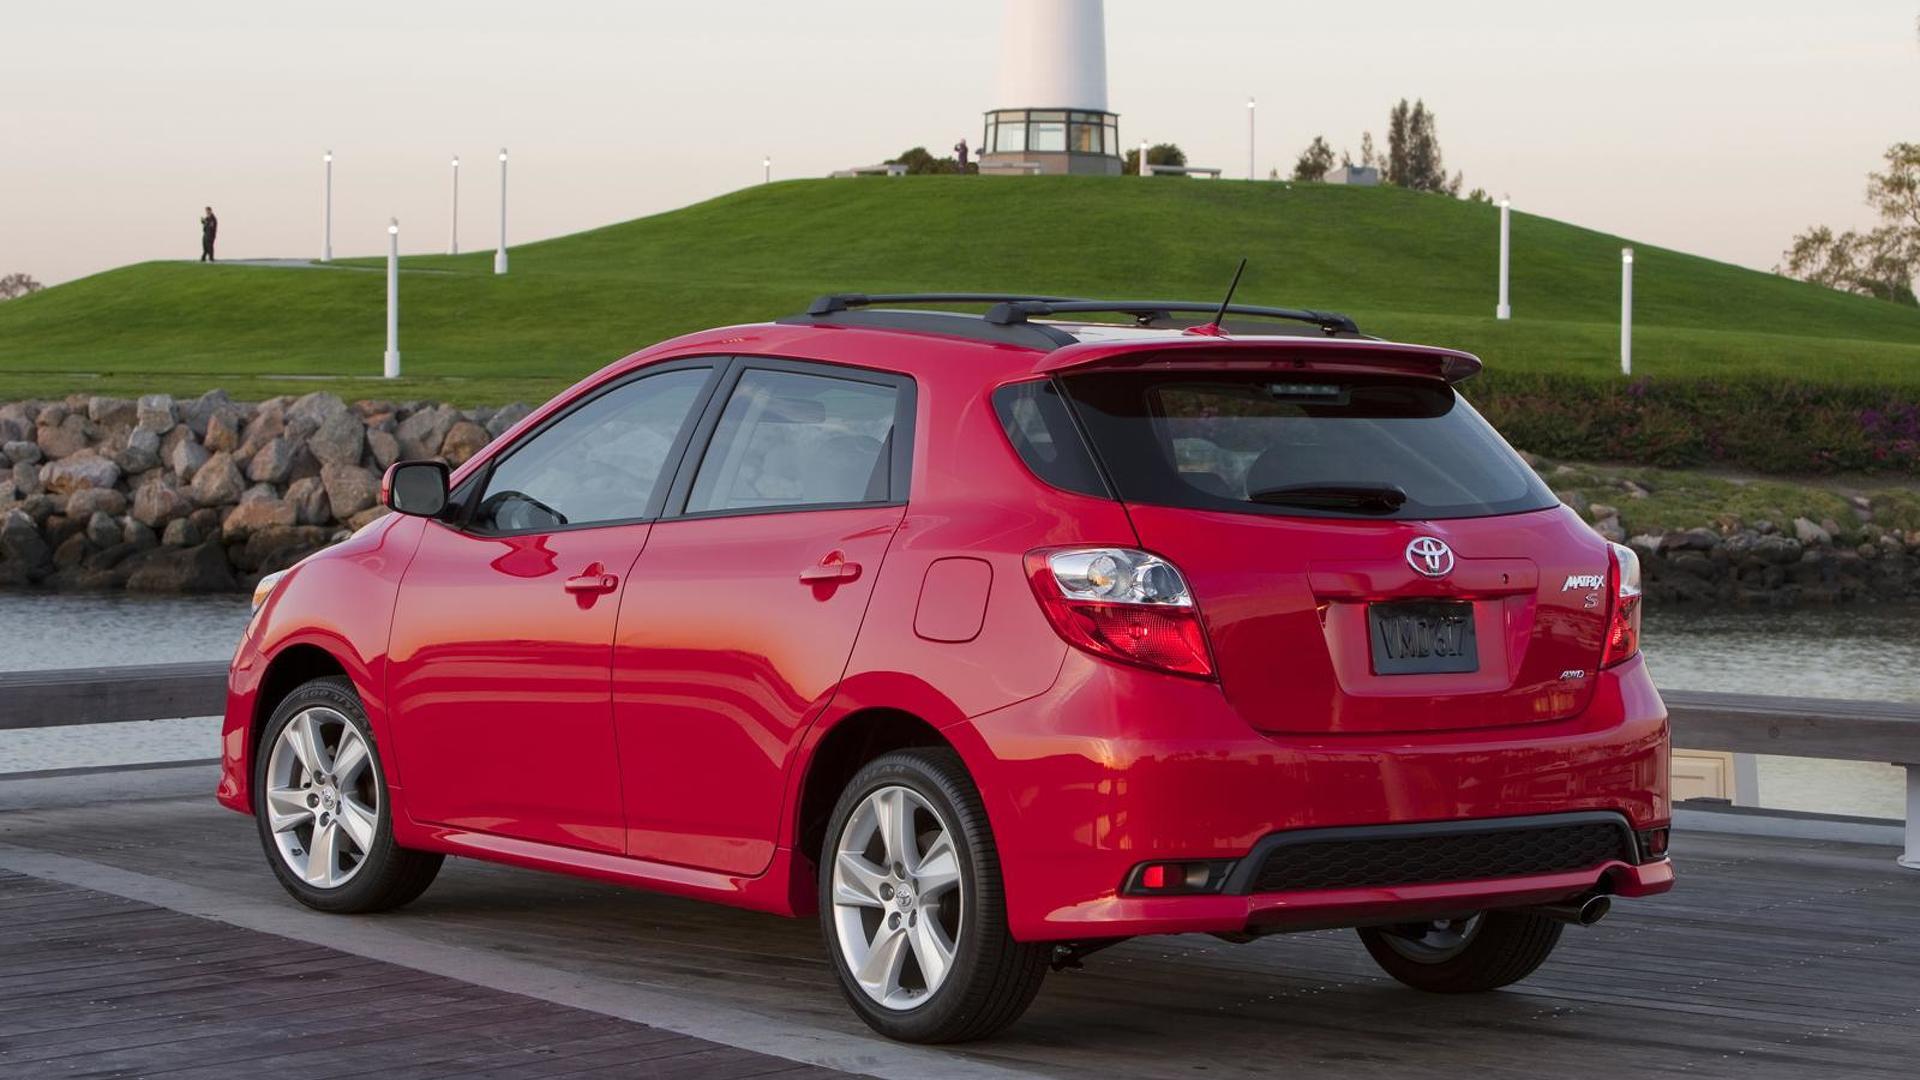 2011 Toyota Matrix unveiled in Chicago